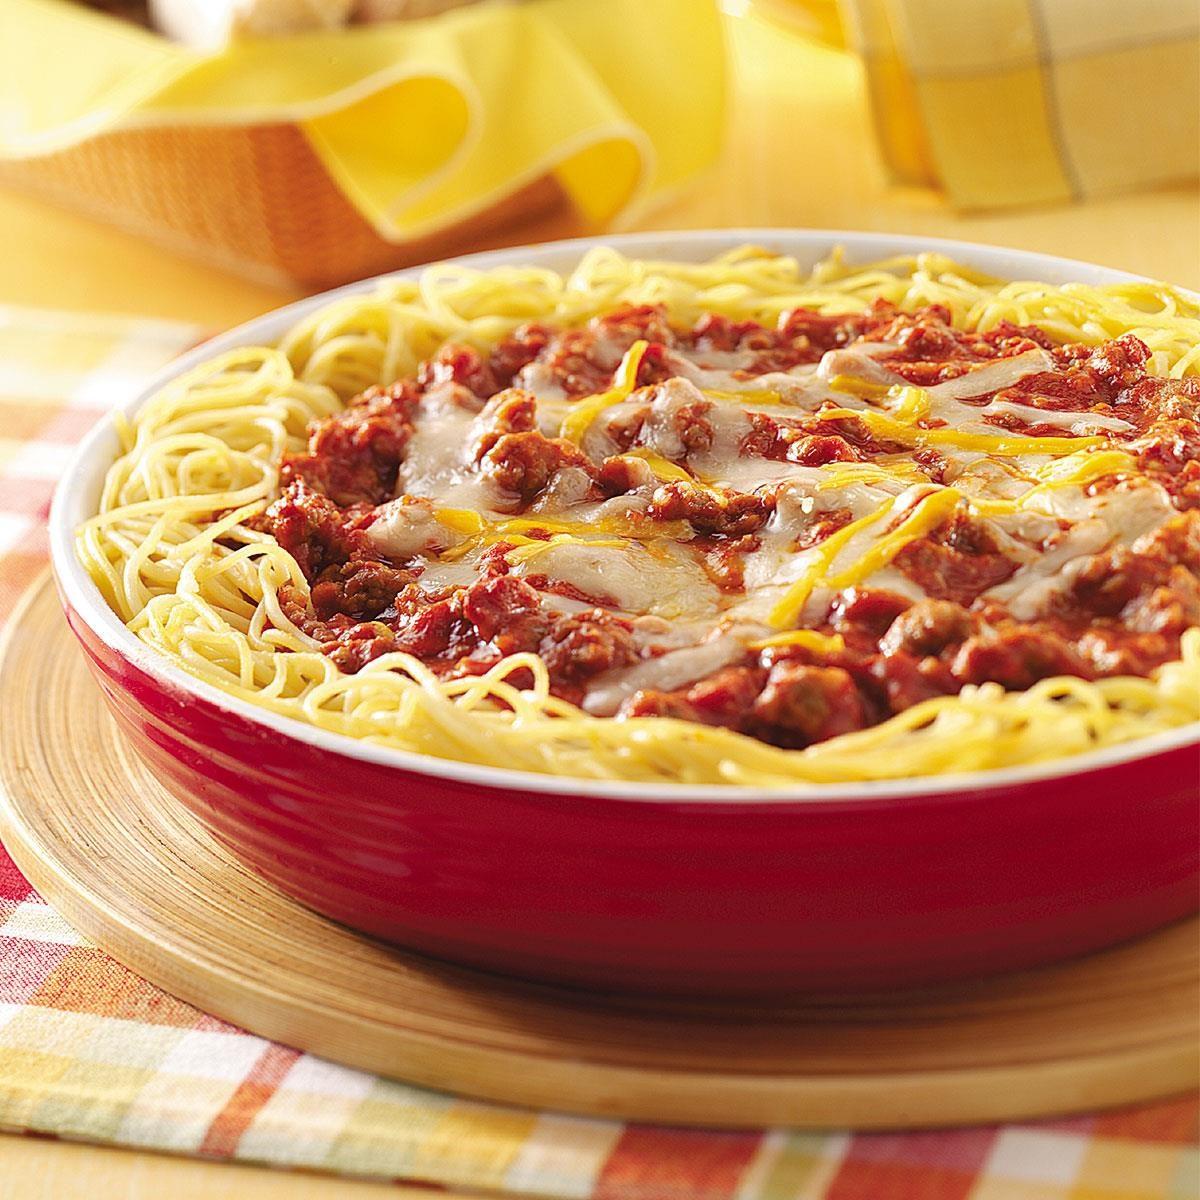 70 Saucy Creamy And Cheesy Italian Christmas Food Recipes: Cheesy Sausage Spaghetti Pie Recipe